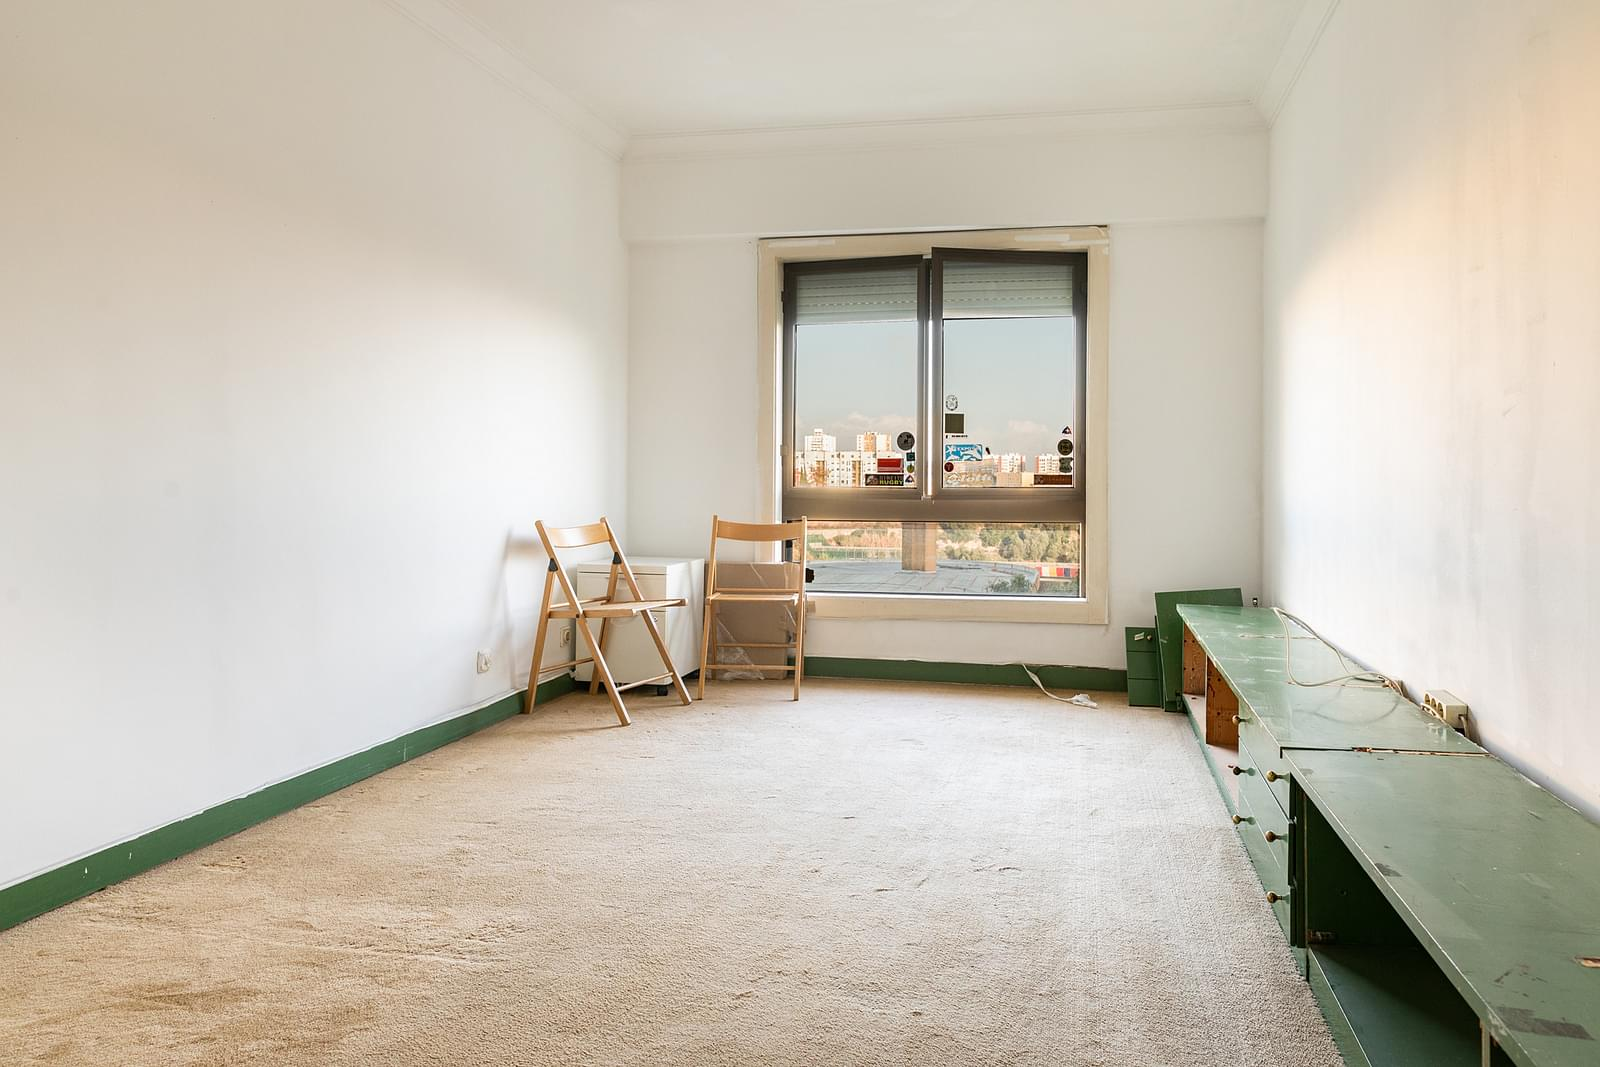 pf18210-apartamento-t4-lisboa-40d6f926-e430-4324-9518-b6c6972a27ed